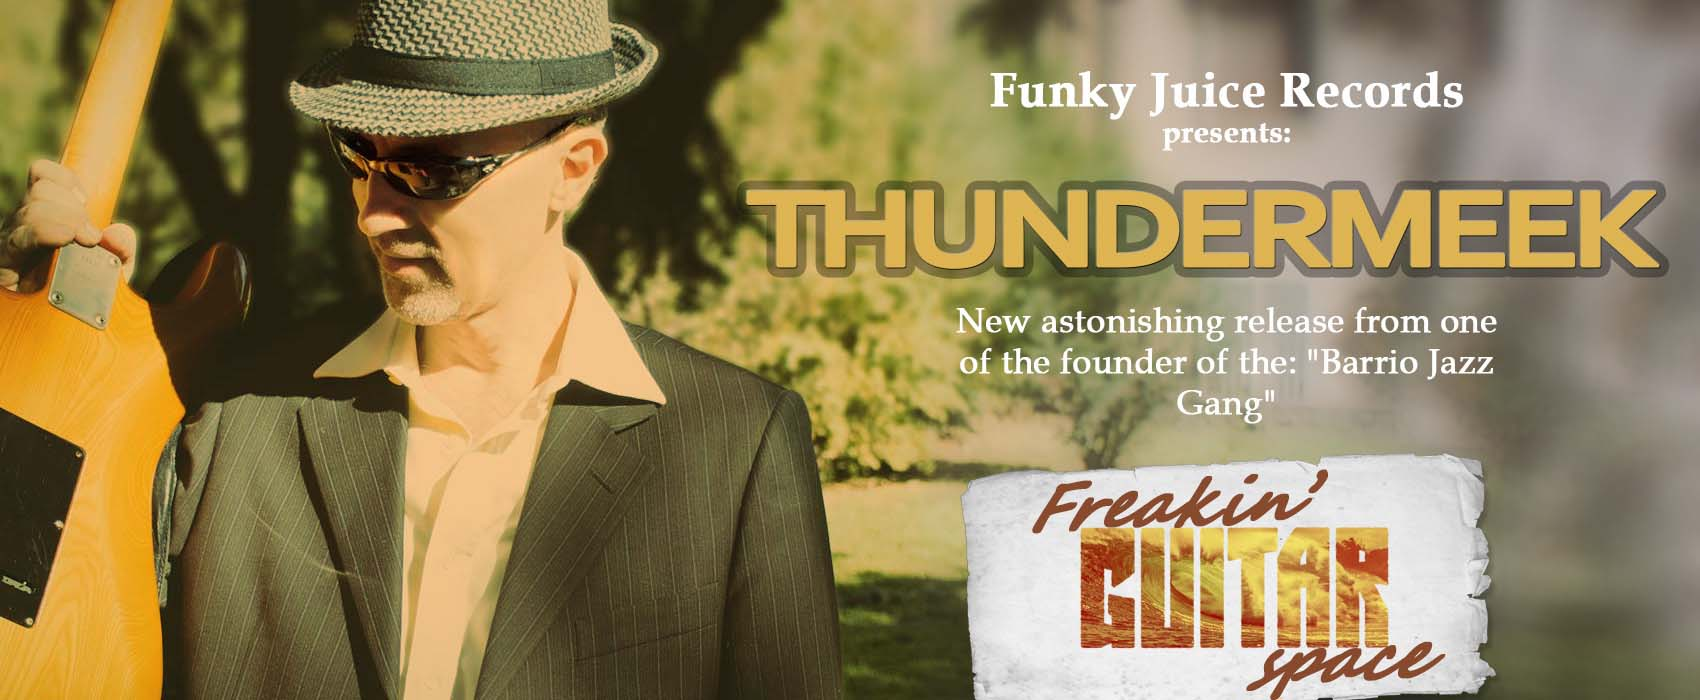 Thundermeek